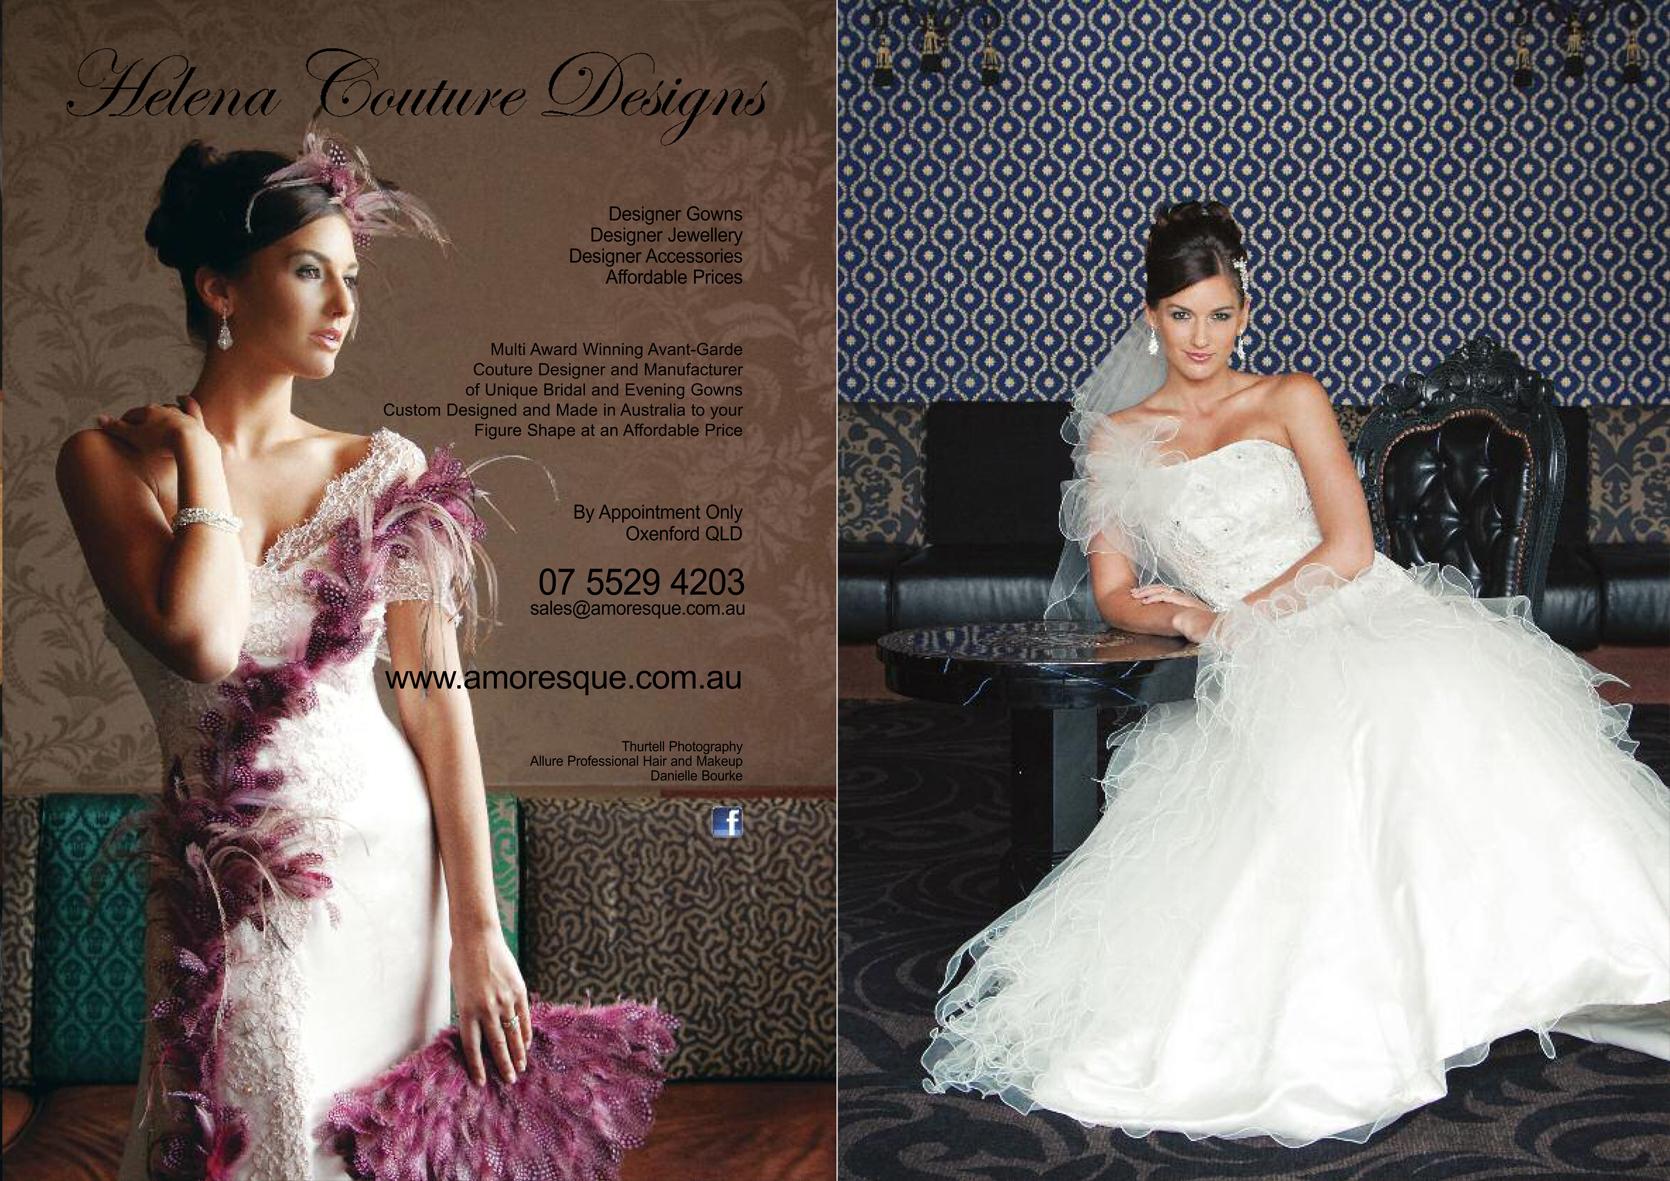 Gold Coast Weddings Magazine, Spring 2012